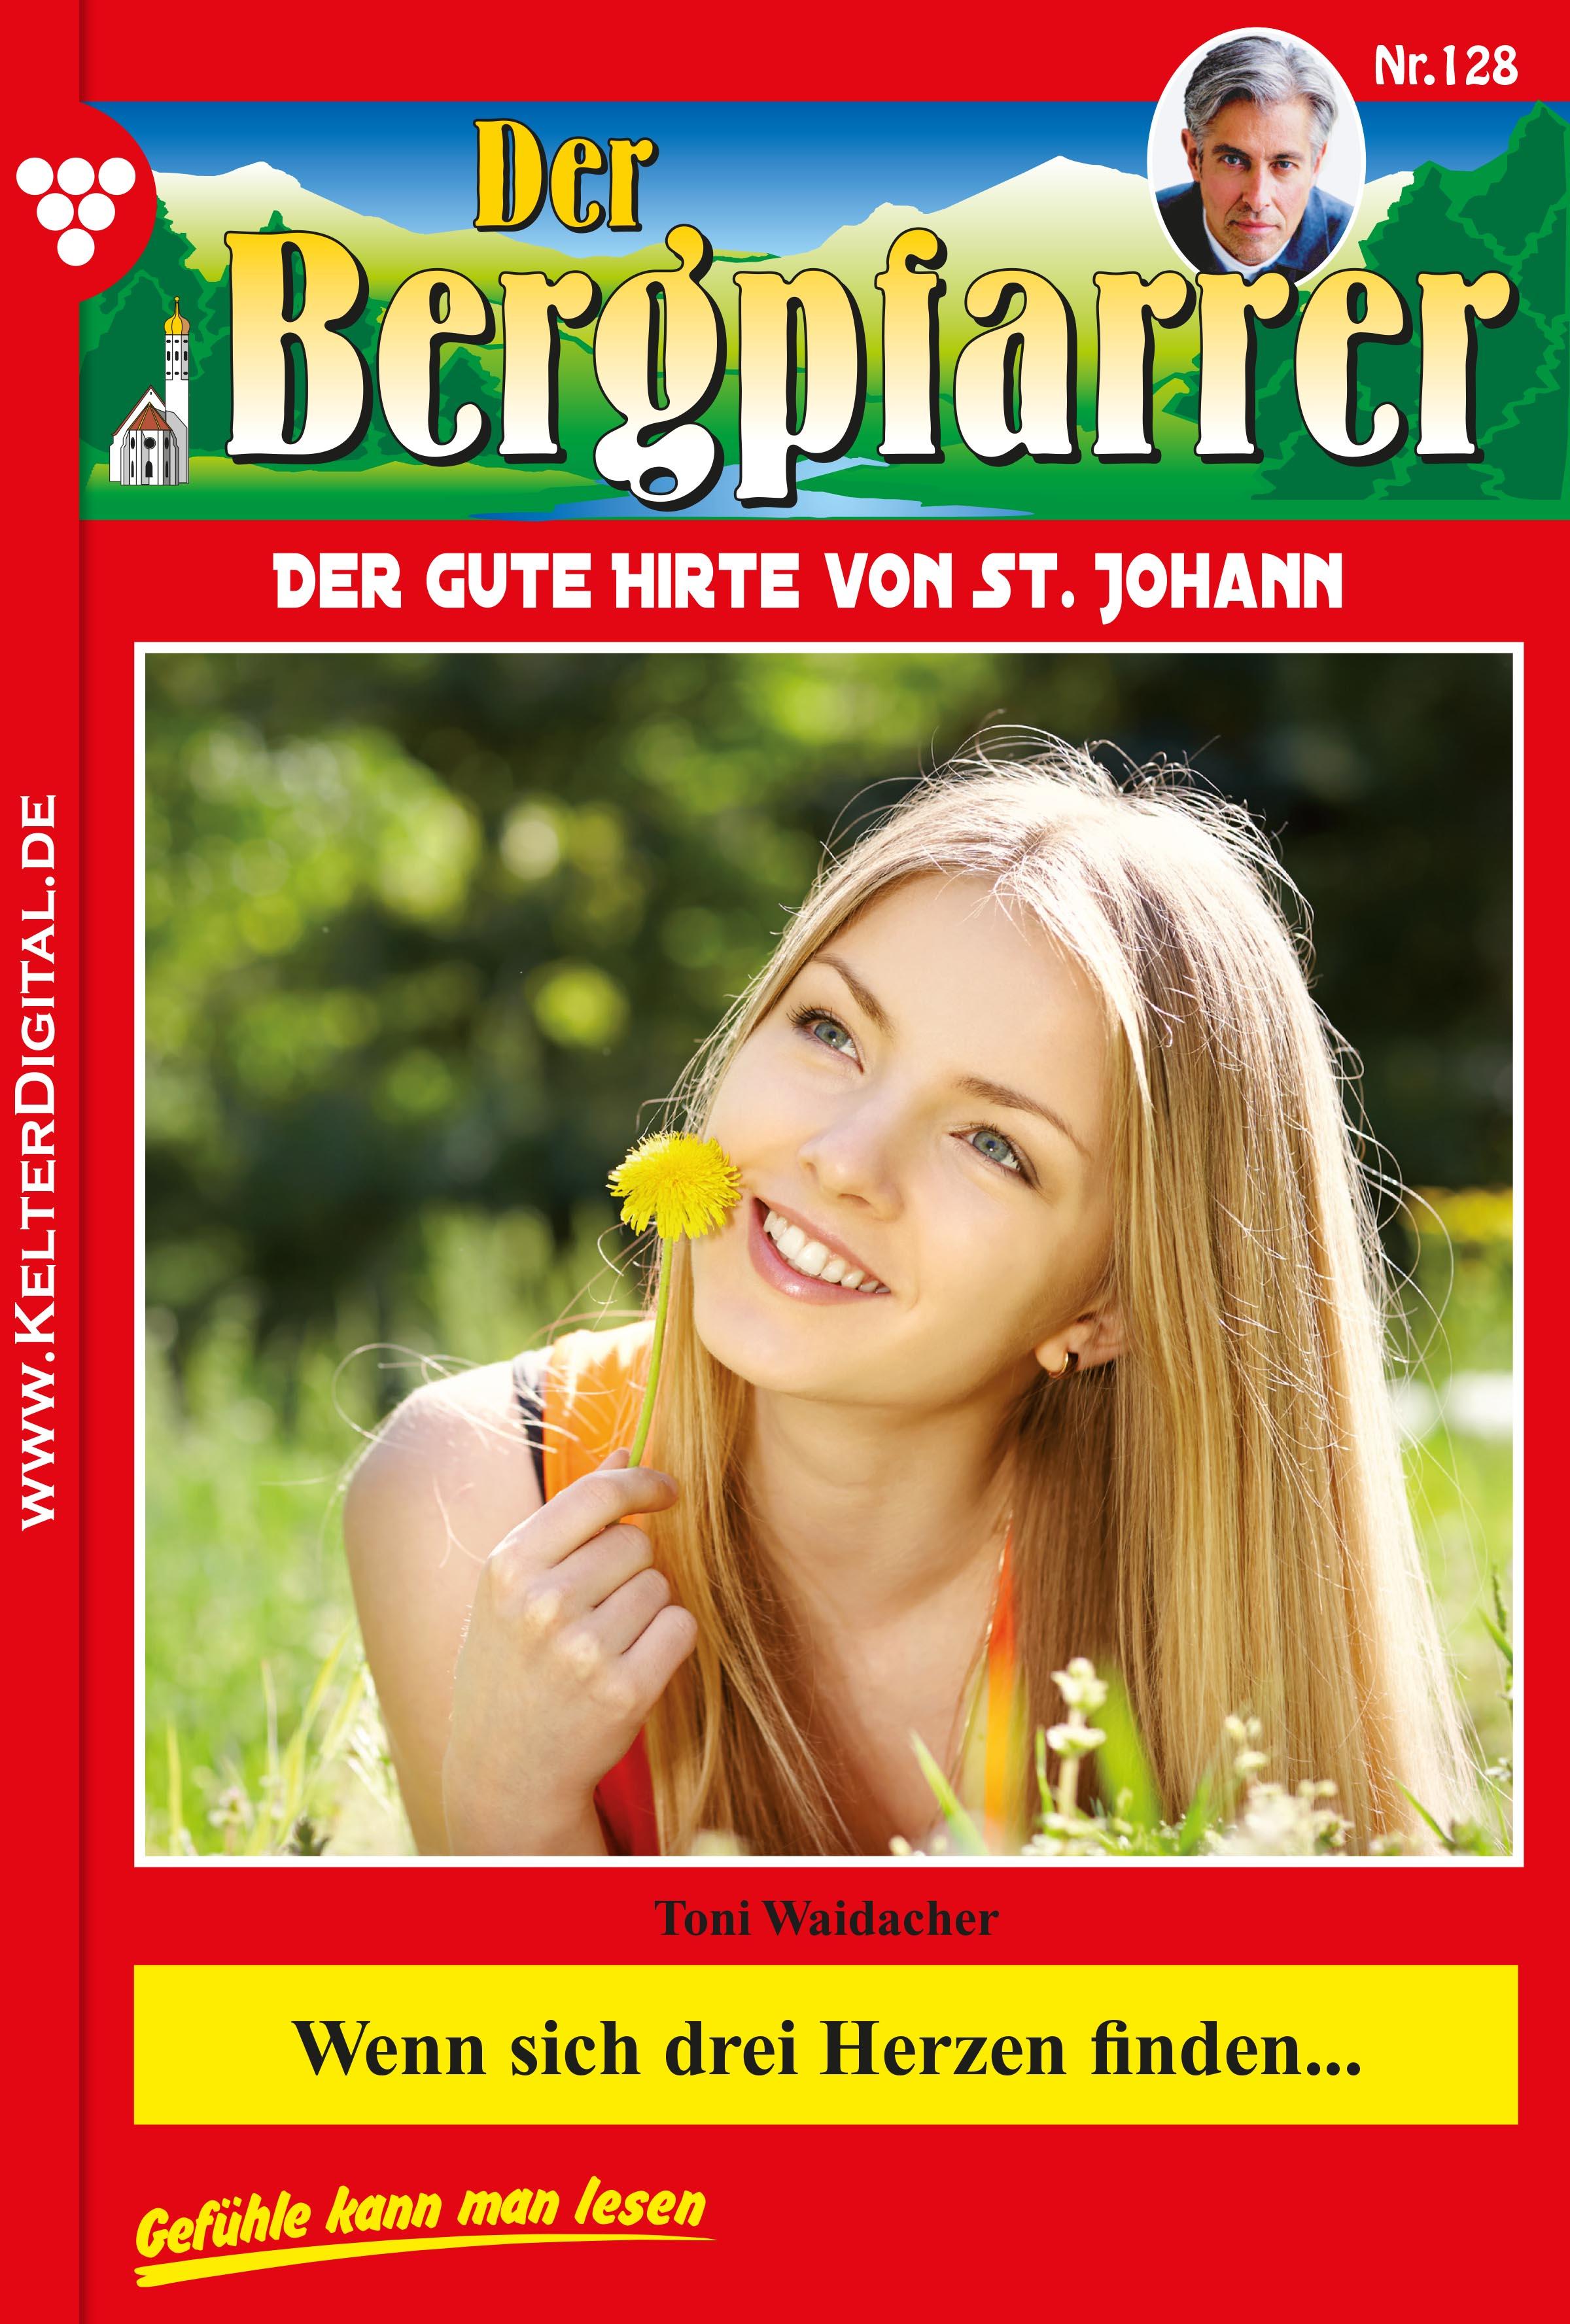 Der Bergpfarrer 128 – Heimatroman ( Toni Waidacher  )